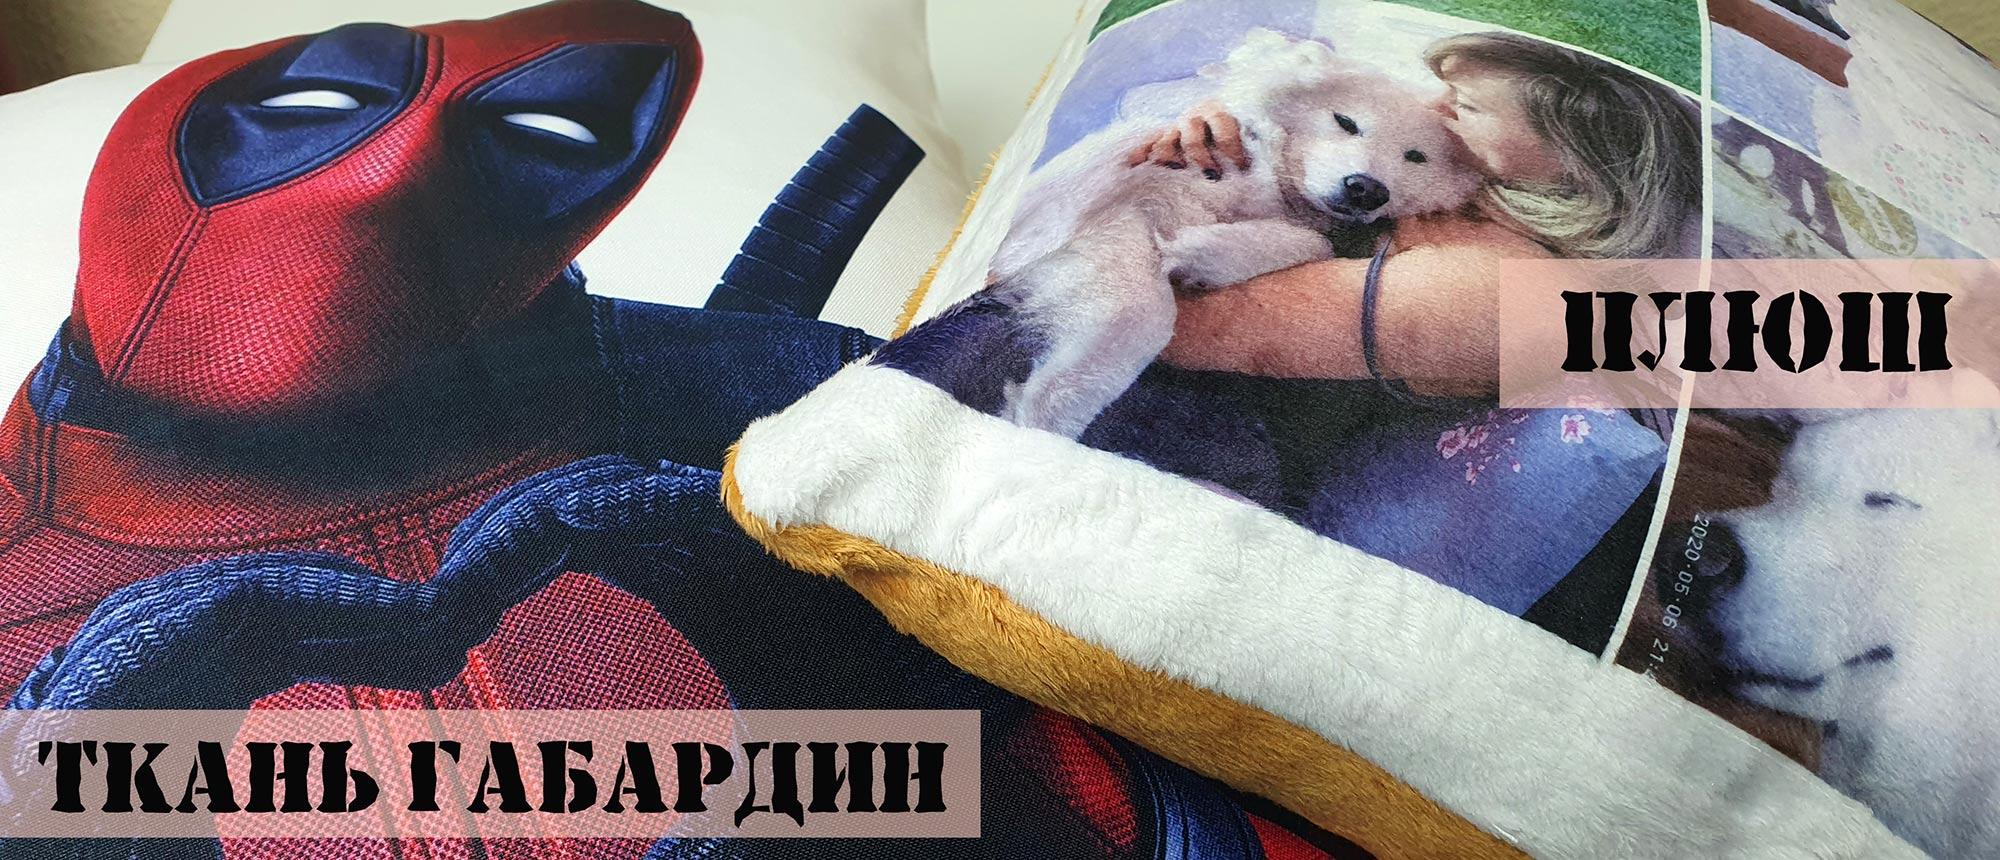 Образец подушки с ткани плюш и габардин